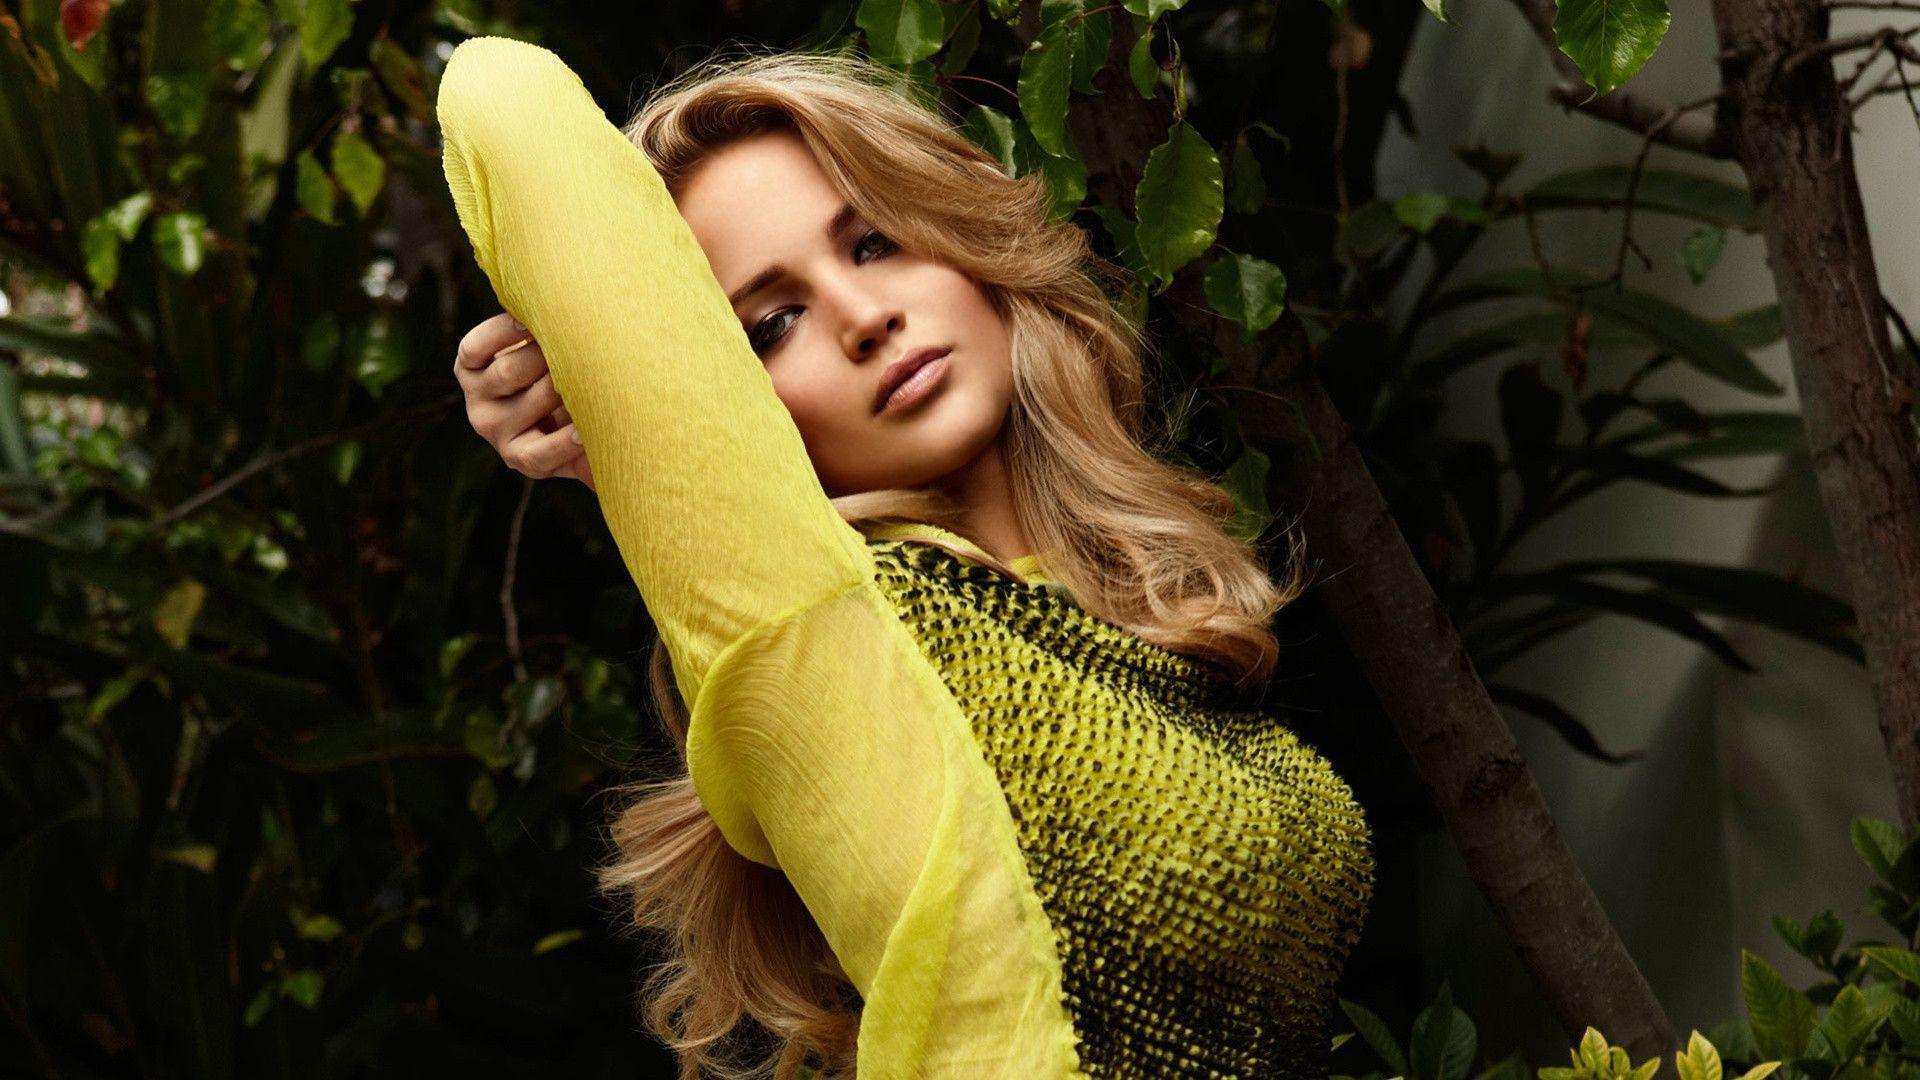 Jennifer Lawrence Wallpapers 2014 | Jennifer Lawrence Images ...